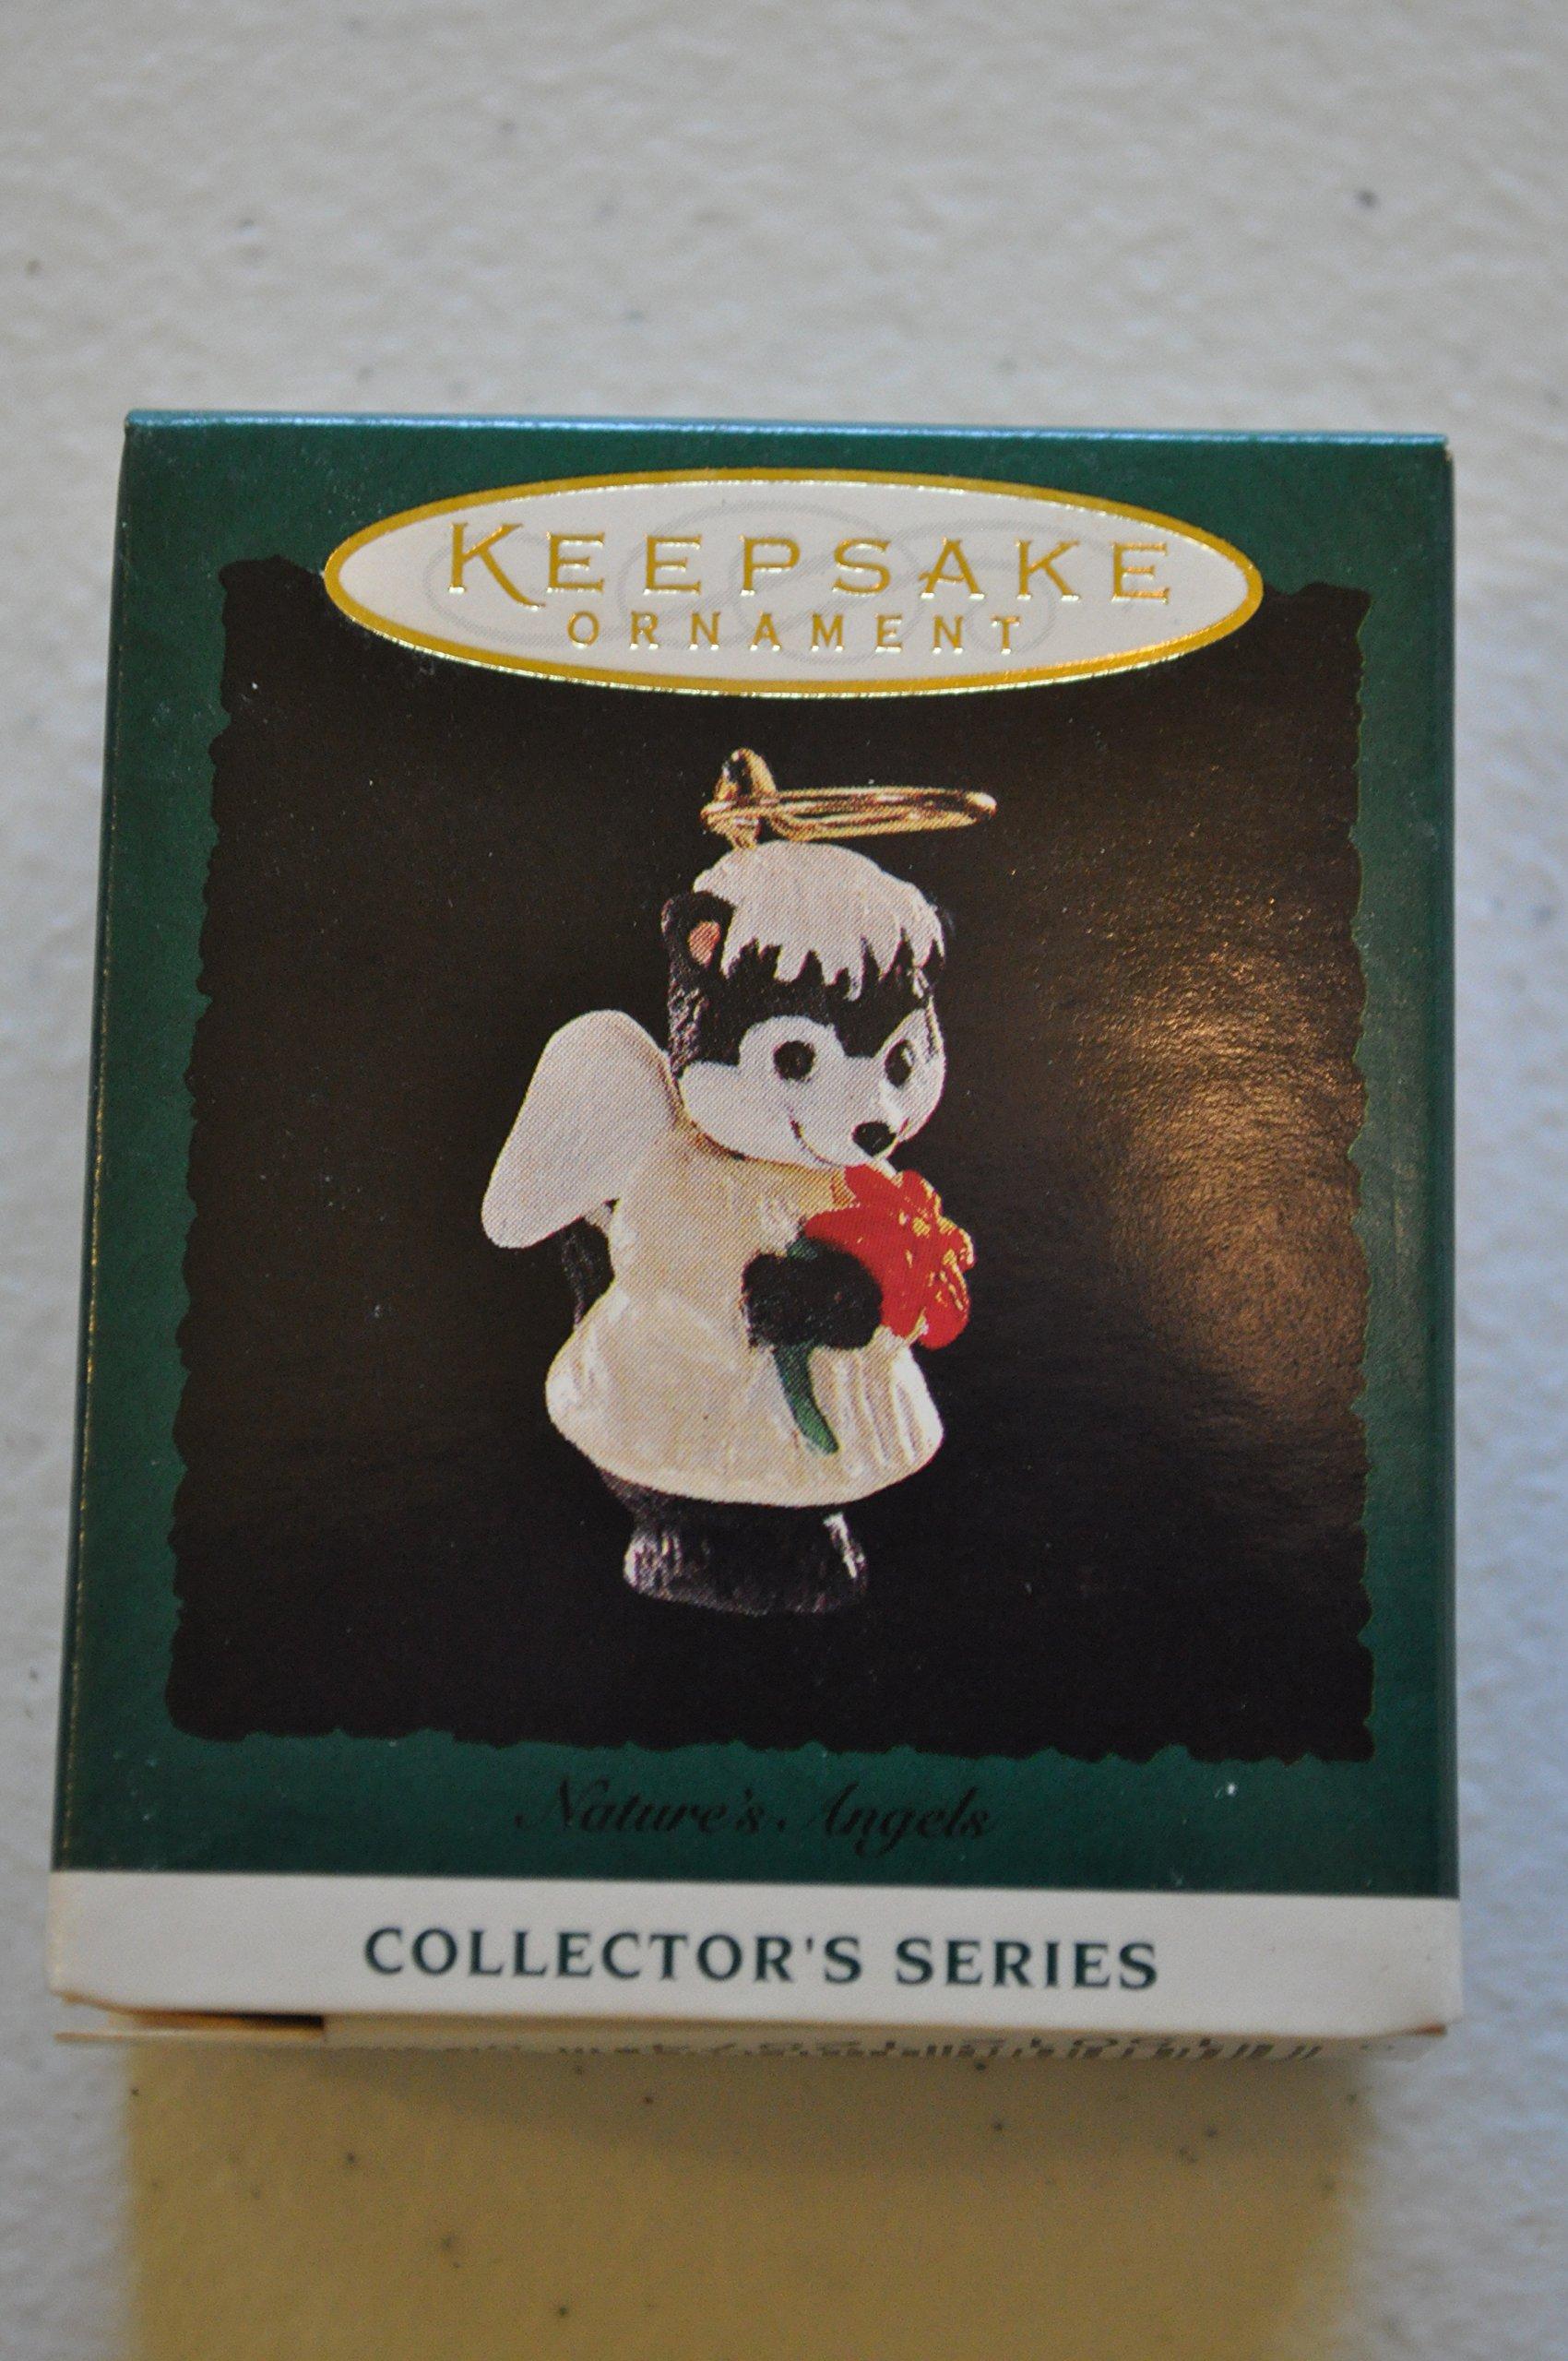 Hallmark Keepsake Ornament ''Nature's Angels'' 1994 Collector's Series 5th in Series (QXM512-6)